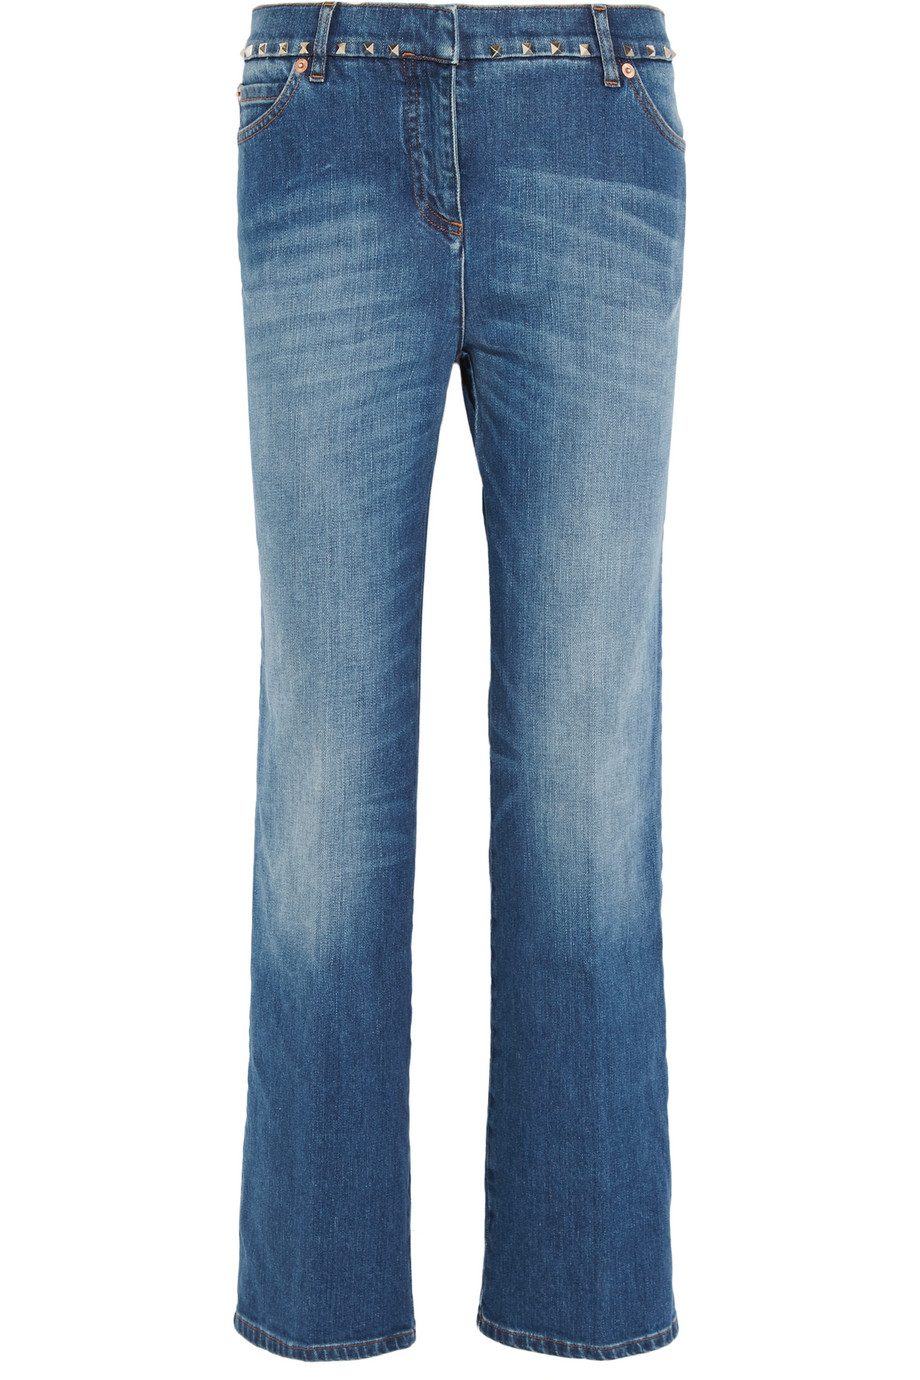 Valentino Studded Cropped Mid-Rise Boyfriend Jeans, Mid Denim, Women's, Size: 29